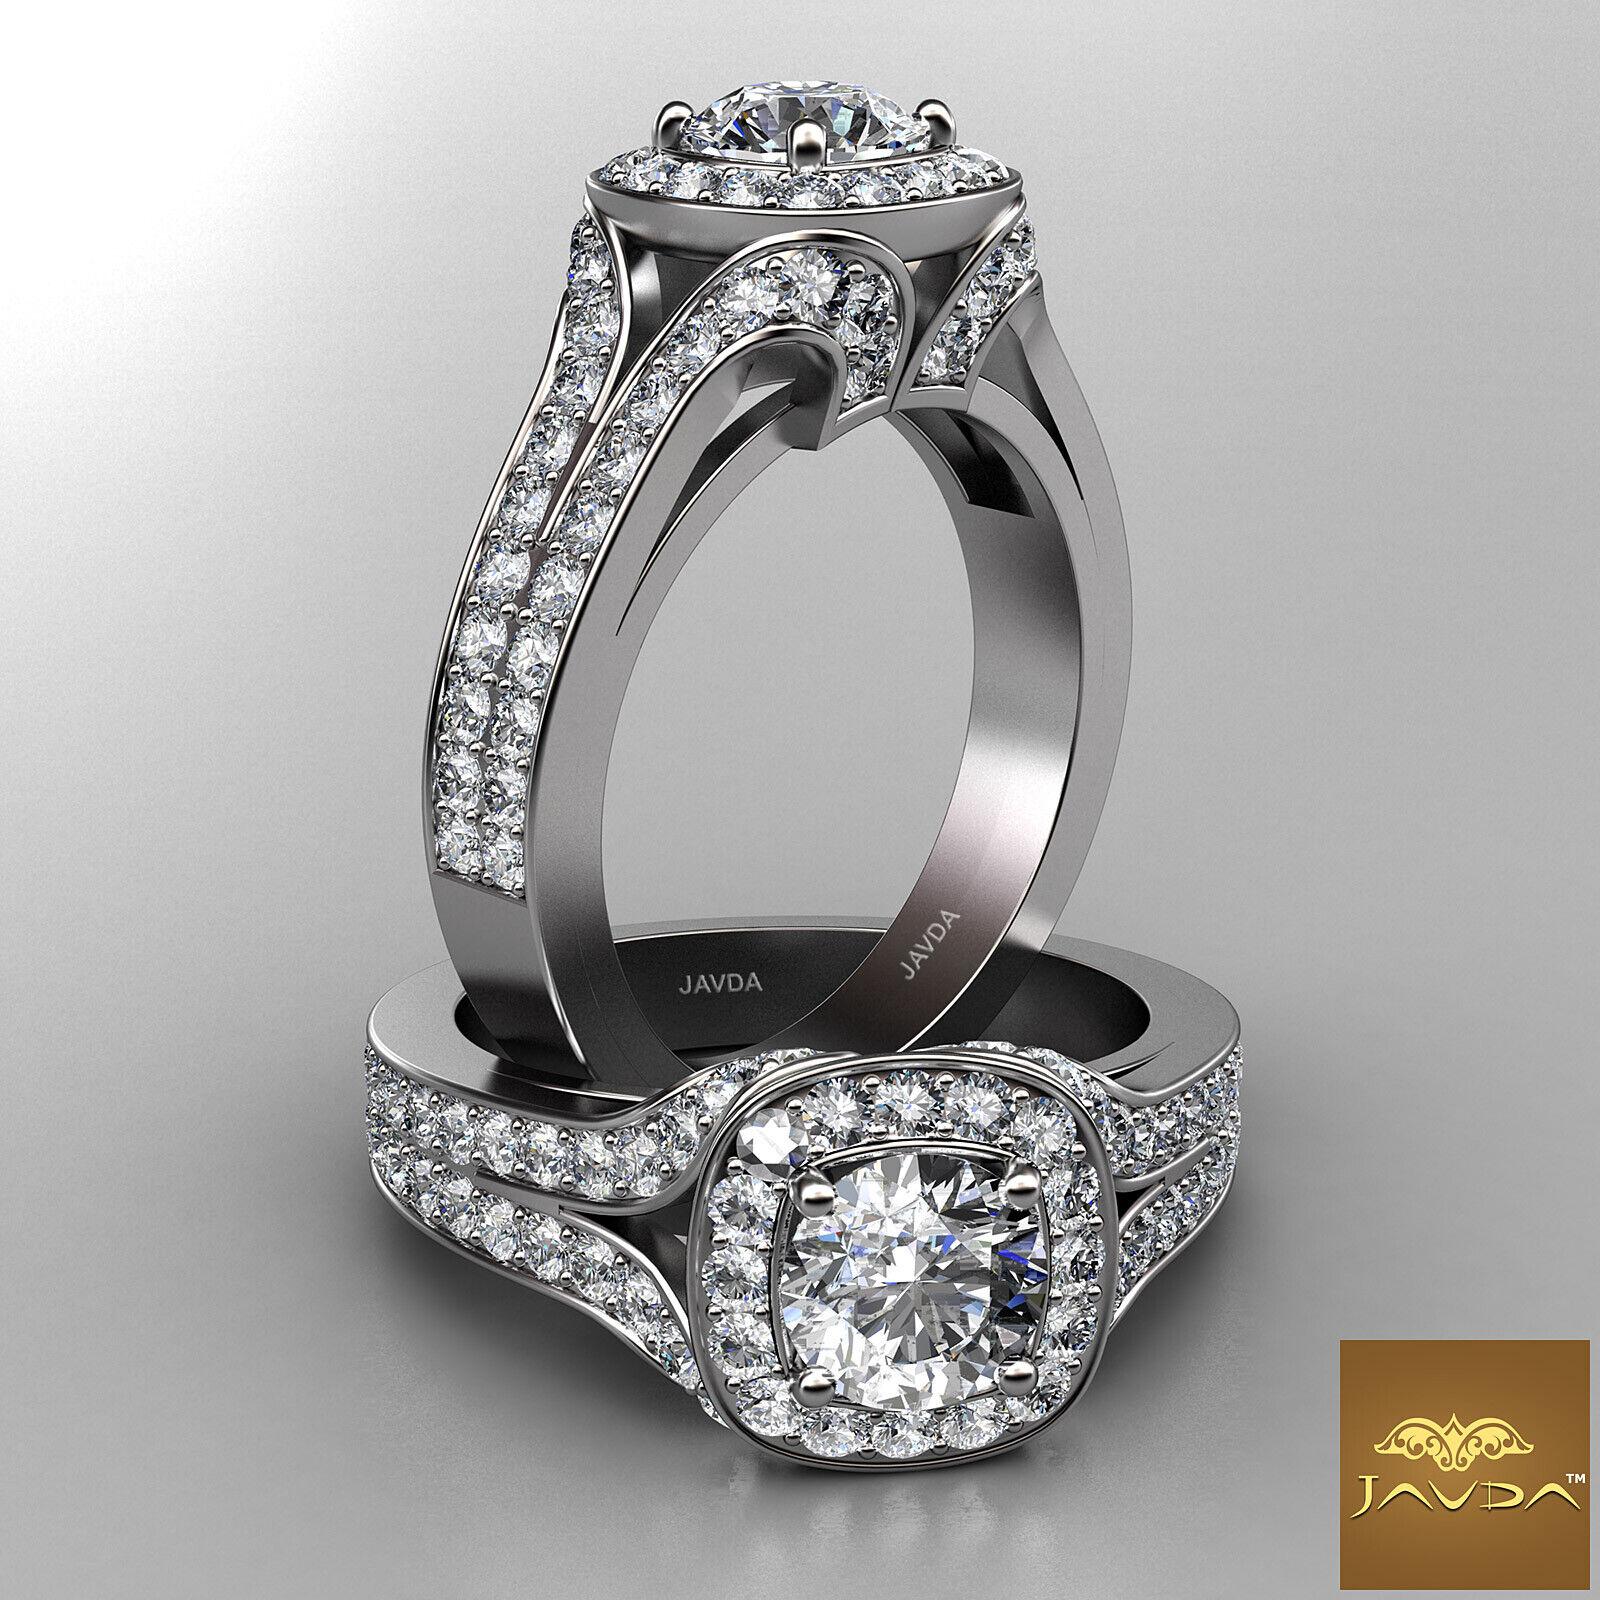 Halo Split Shank Round Diamond Engagement Pave Set Ring GIA E Color VVS1 1.9Ct